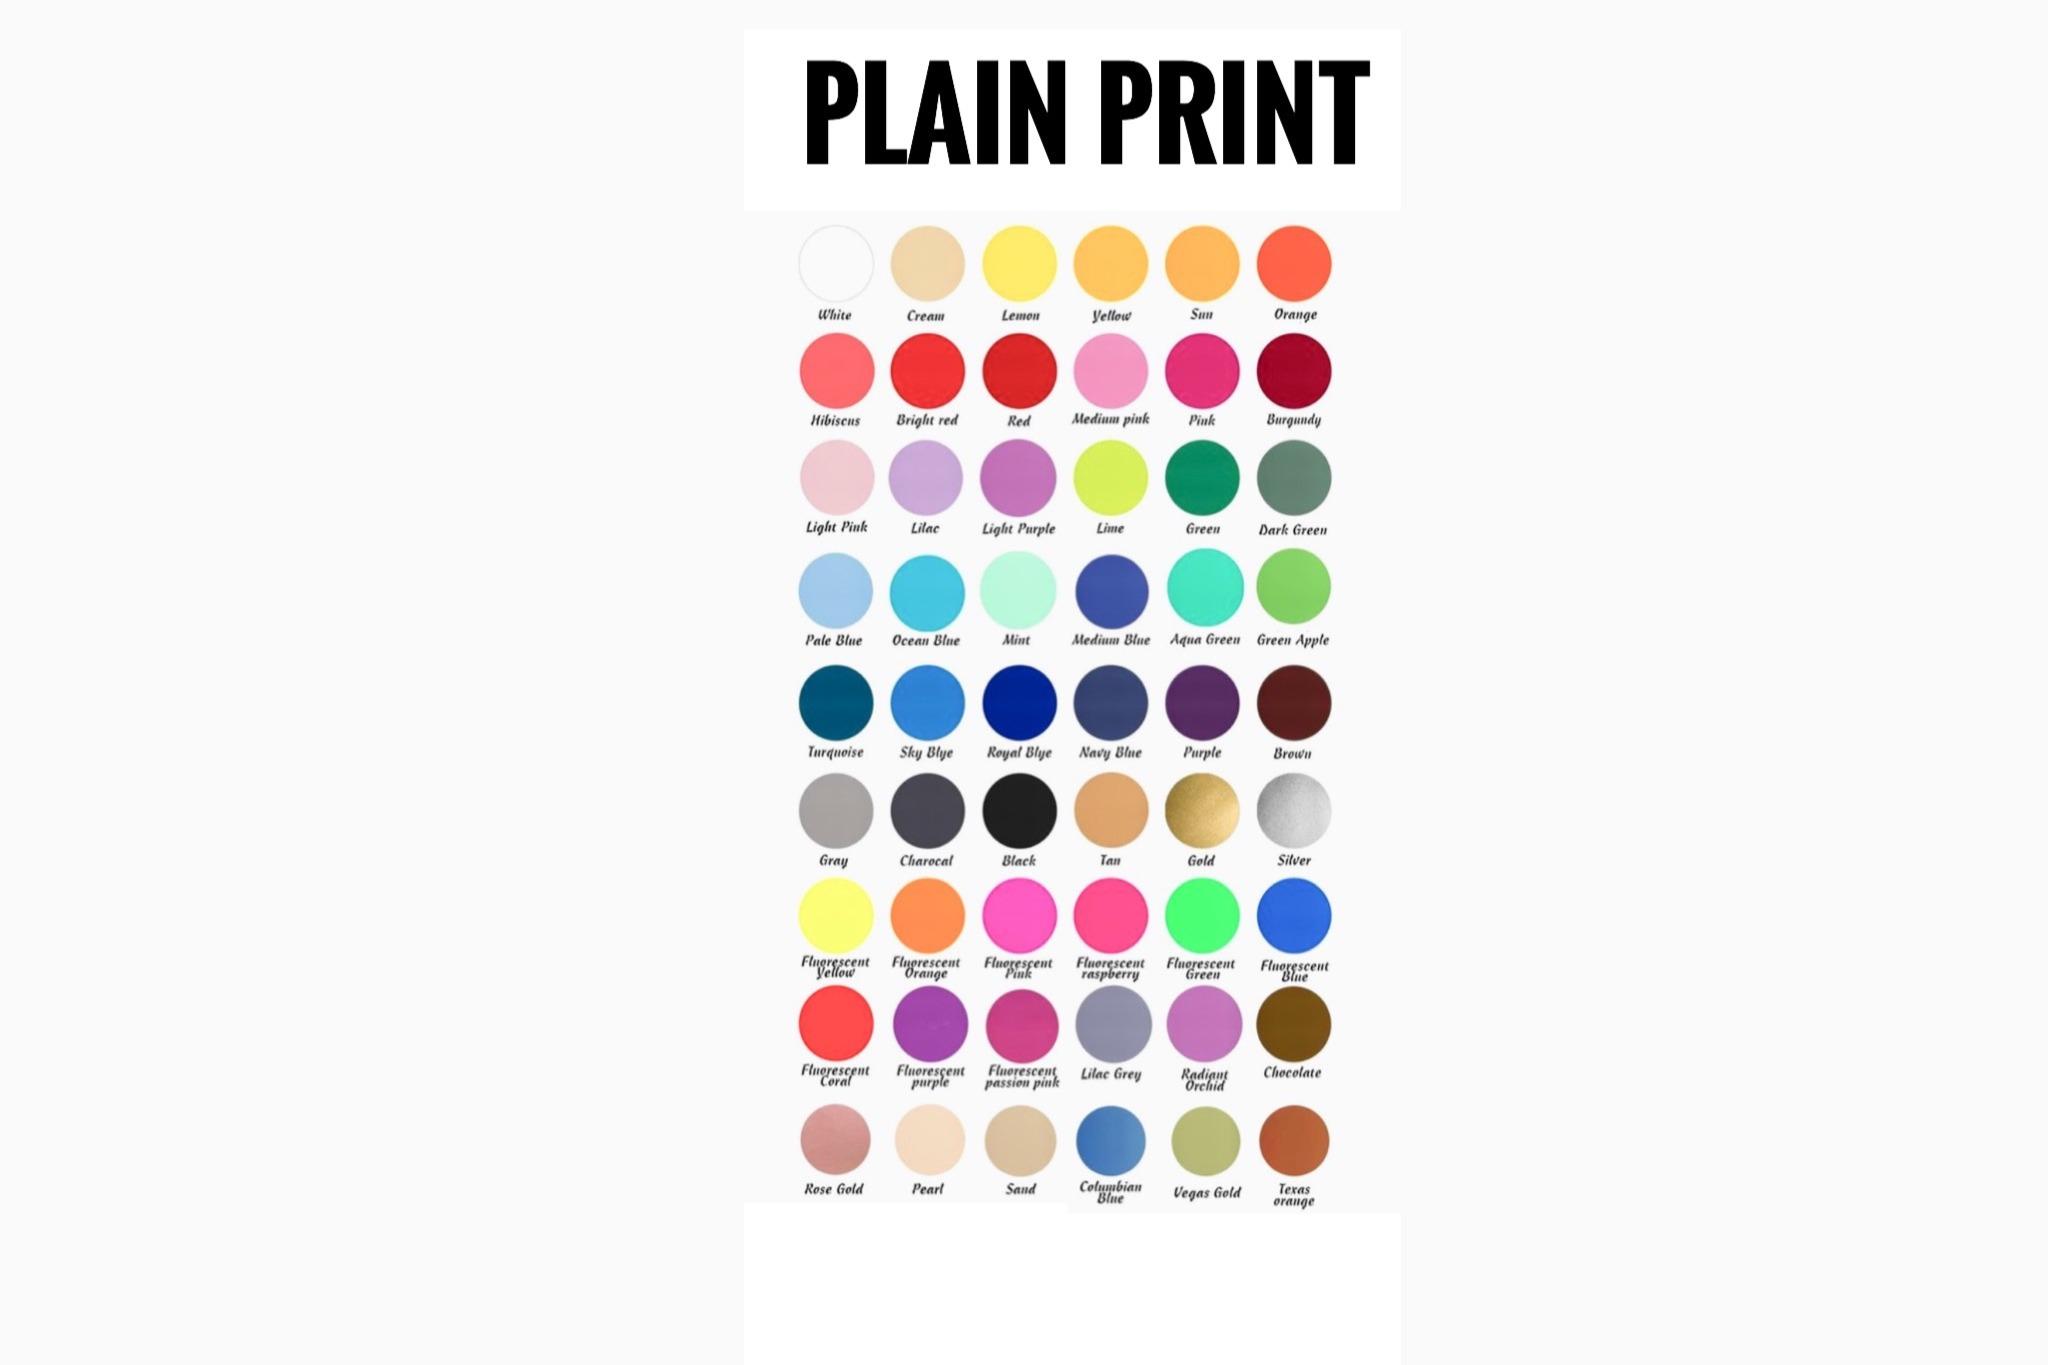 PLAIN PRINT CHART